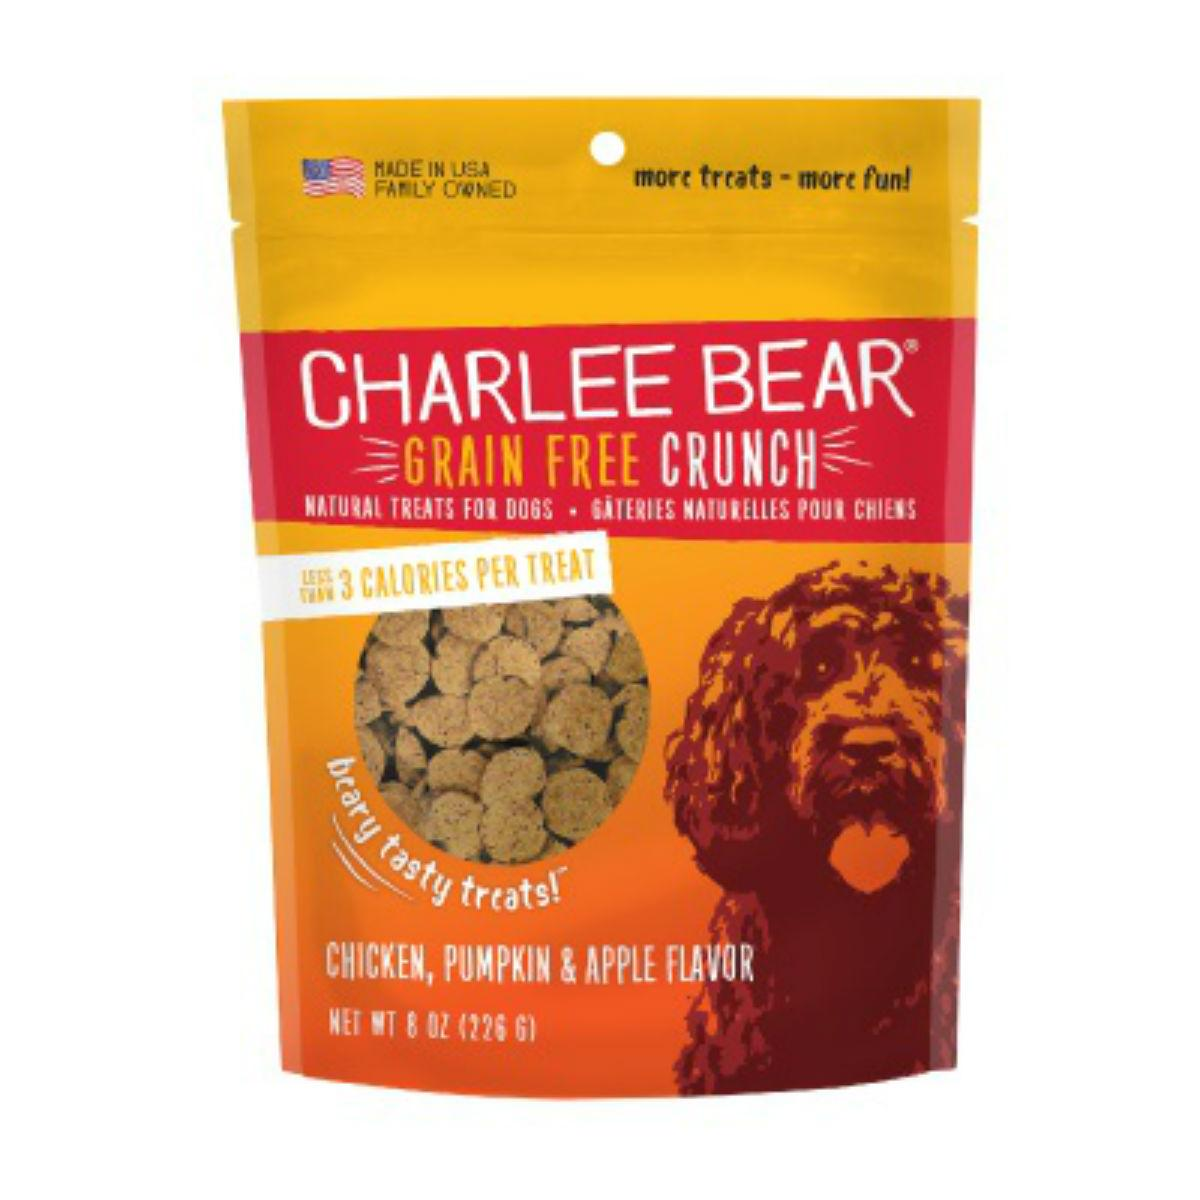 Charlee Bear Grain Free Bear Crunch Dog Treats - Chicken, Pumpkin & Apple